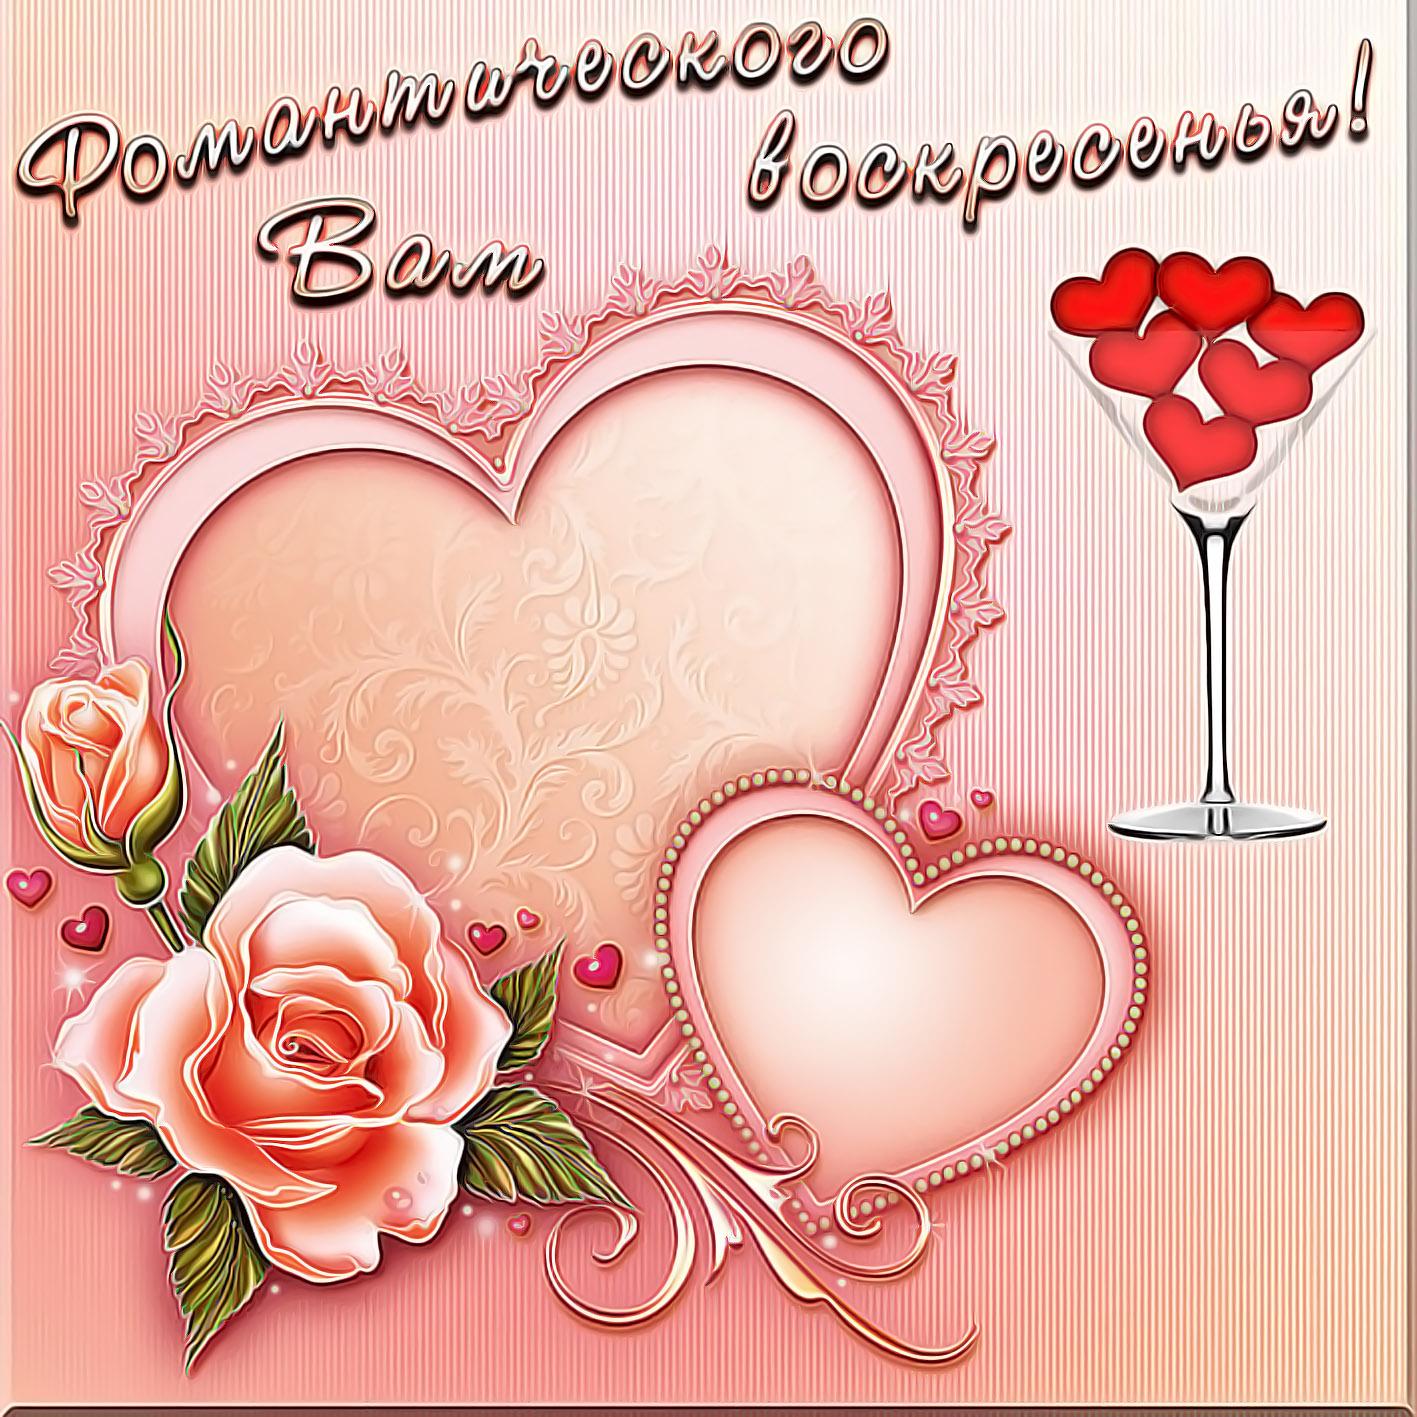 Картинка с сердечками на розовом фоне на воскресенье